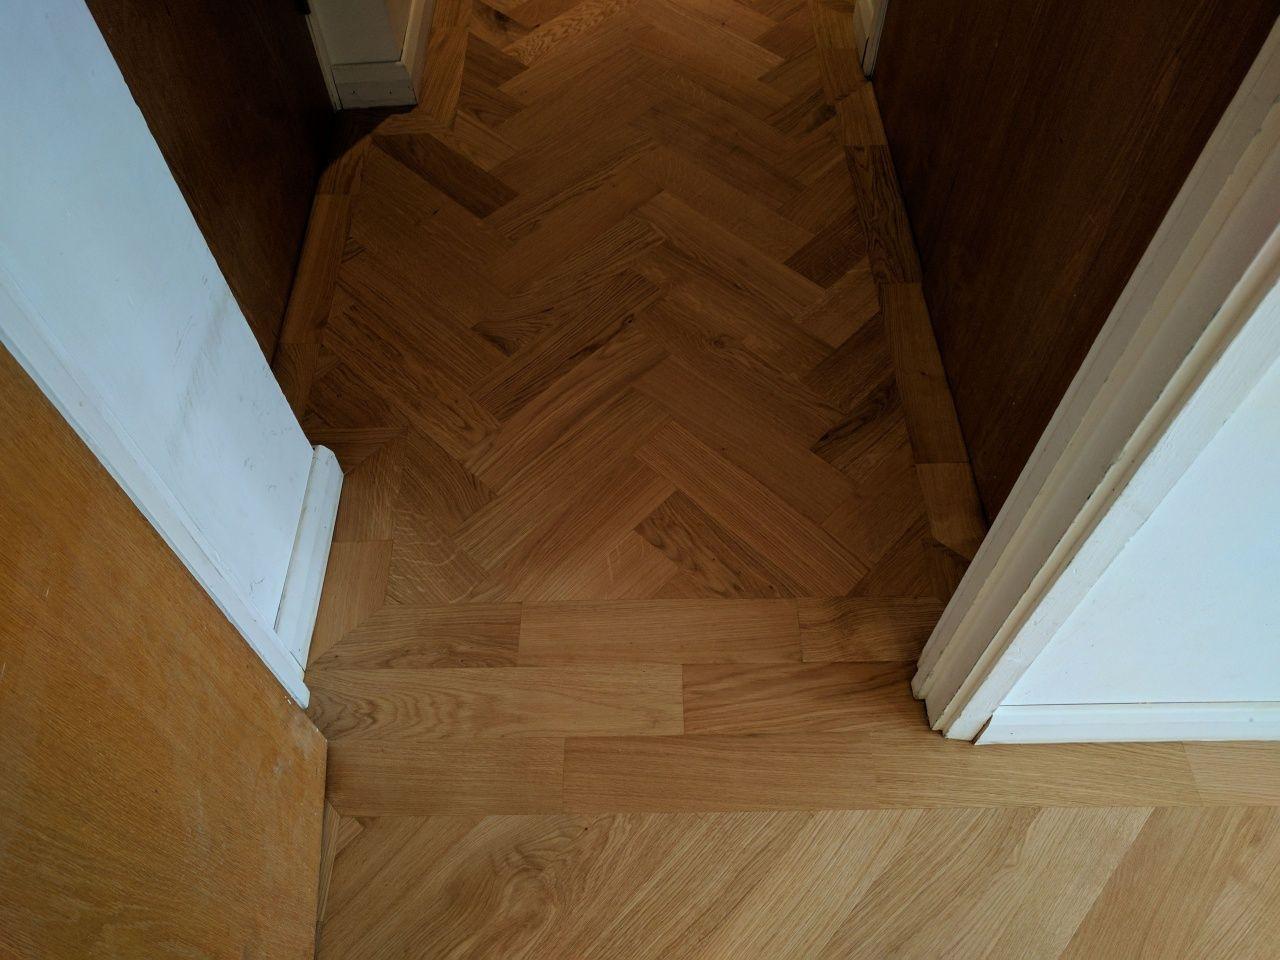 The Flooring Place Bozeman Mt in 2020 Wood parquet